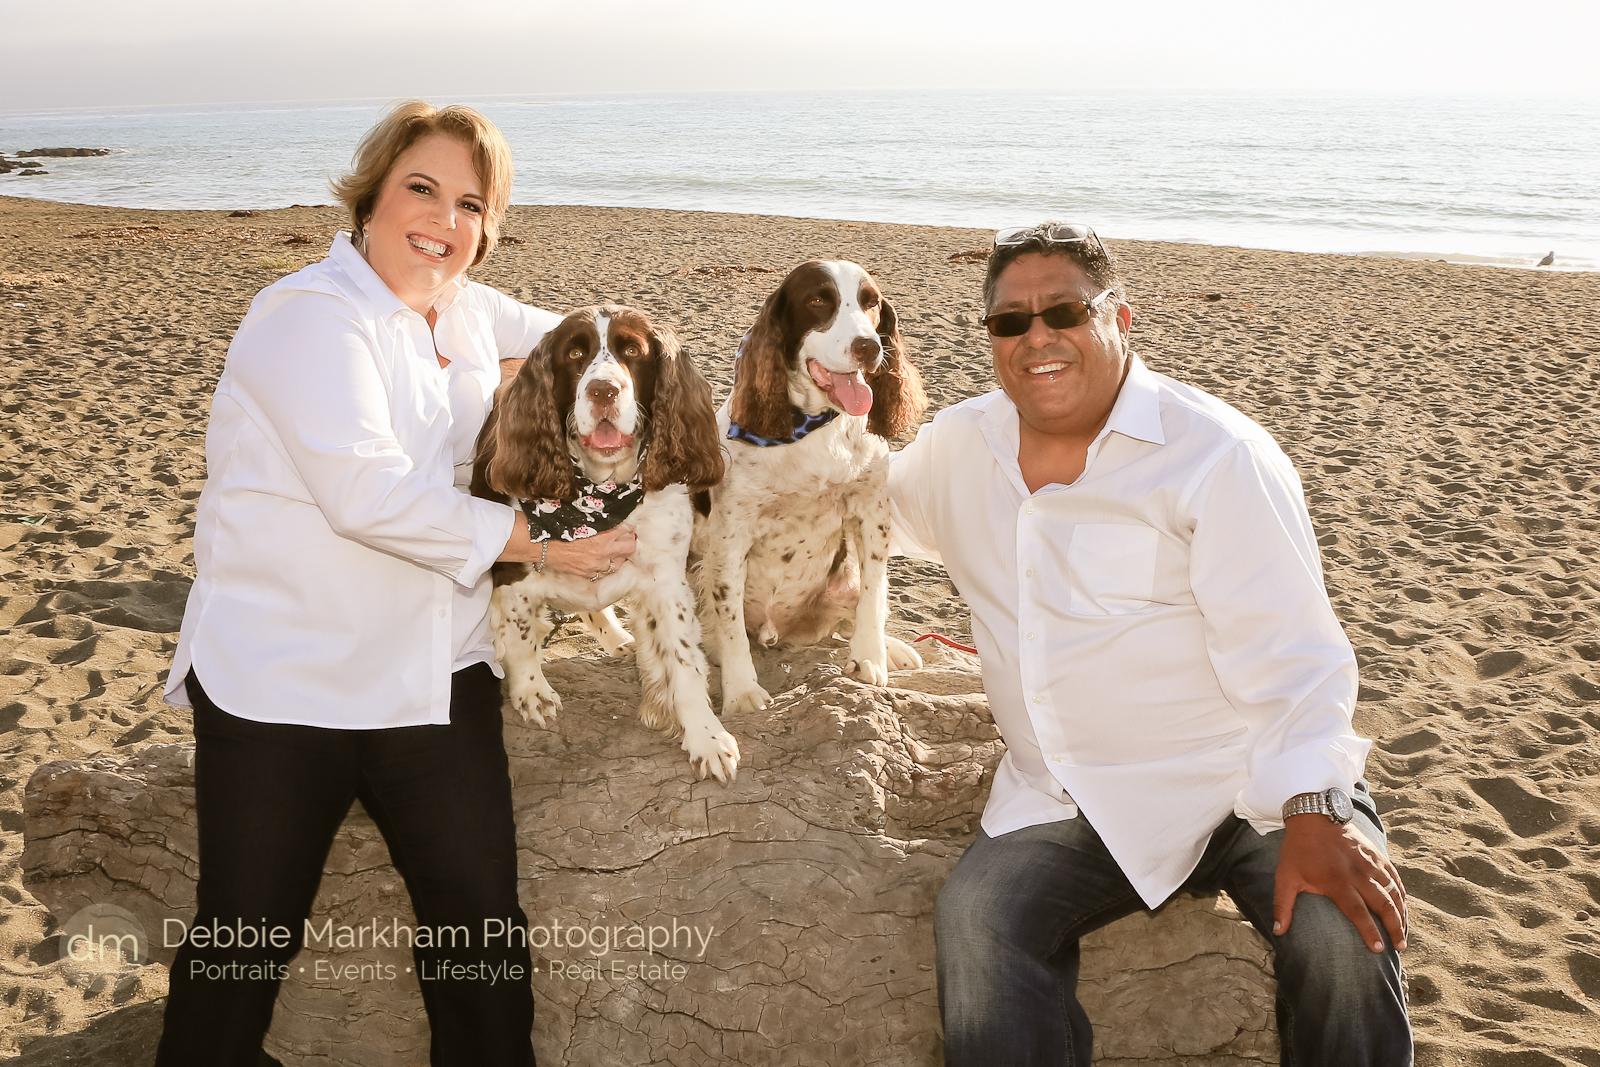 Debbie Markham Photography-Family Photographer_San Luis Obispo_Cambria_Morro Bay_Los Osos_Pet Photographer-3605